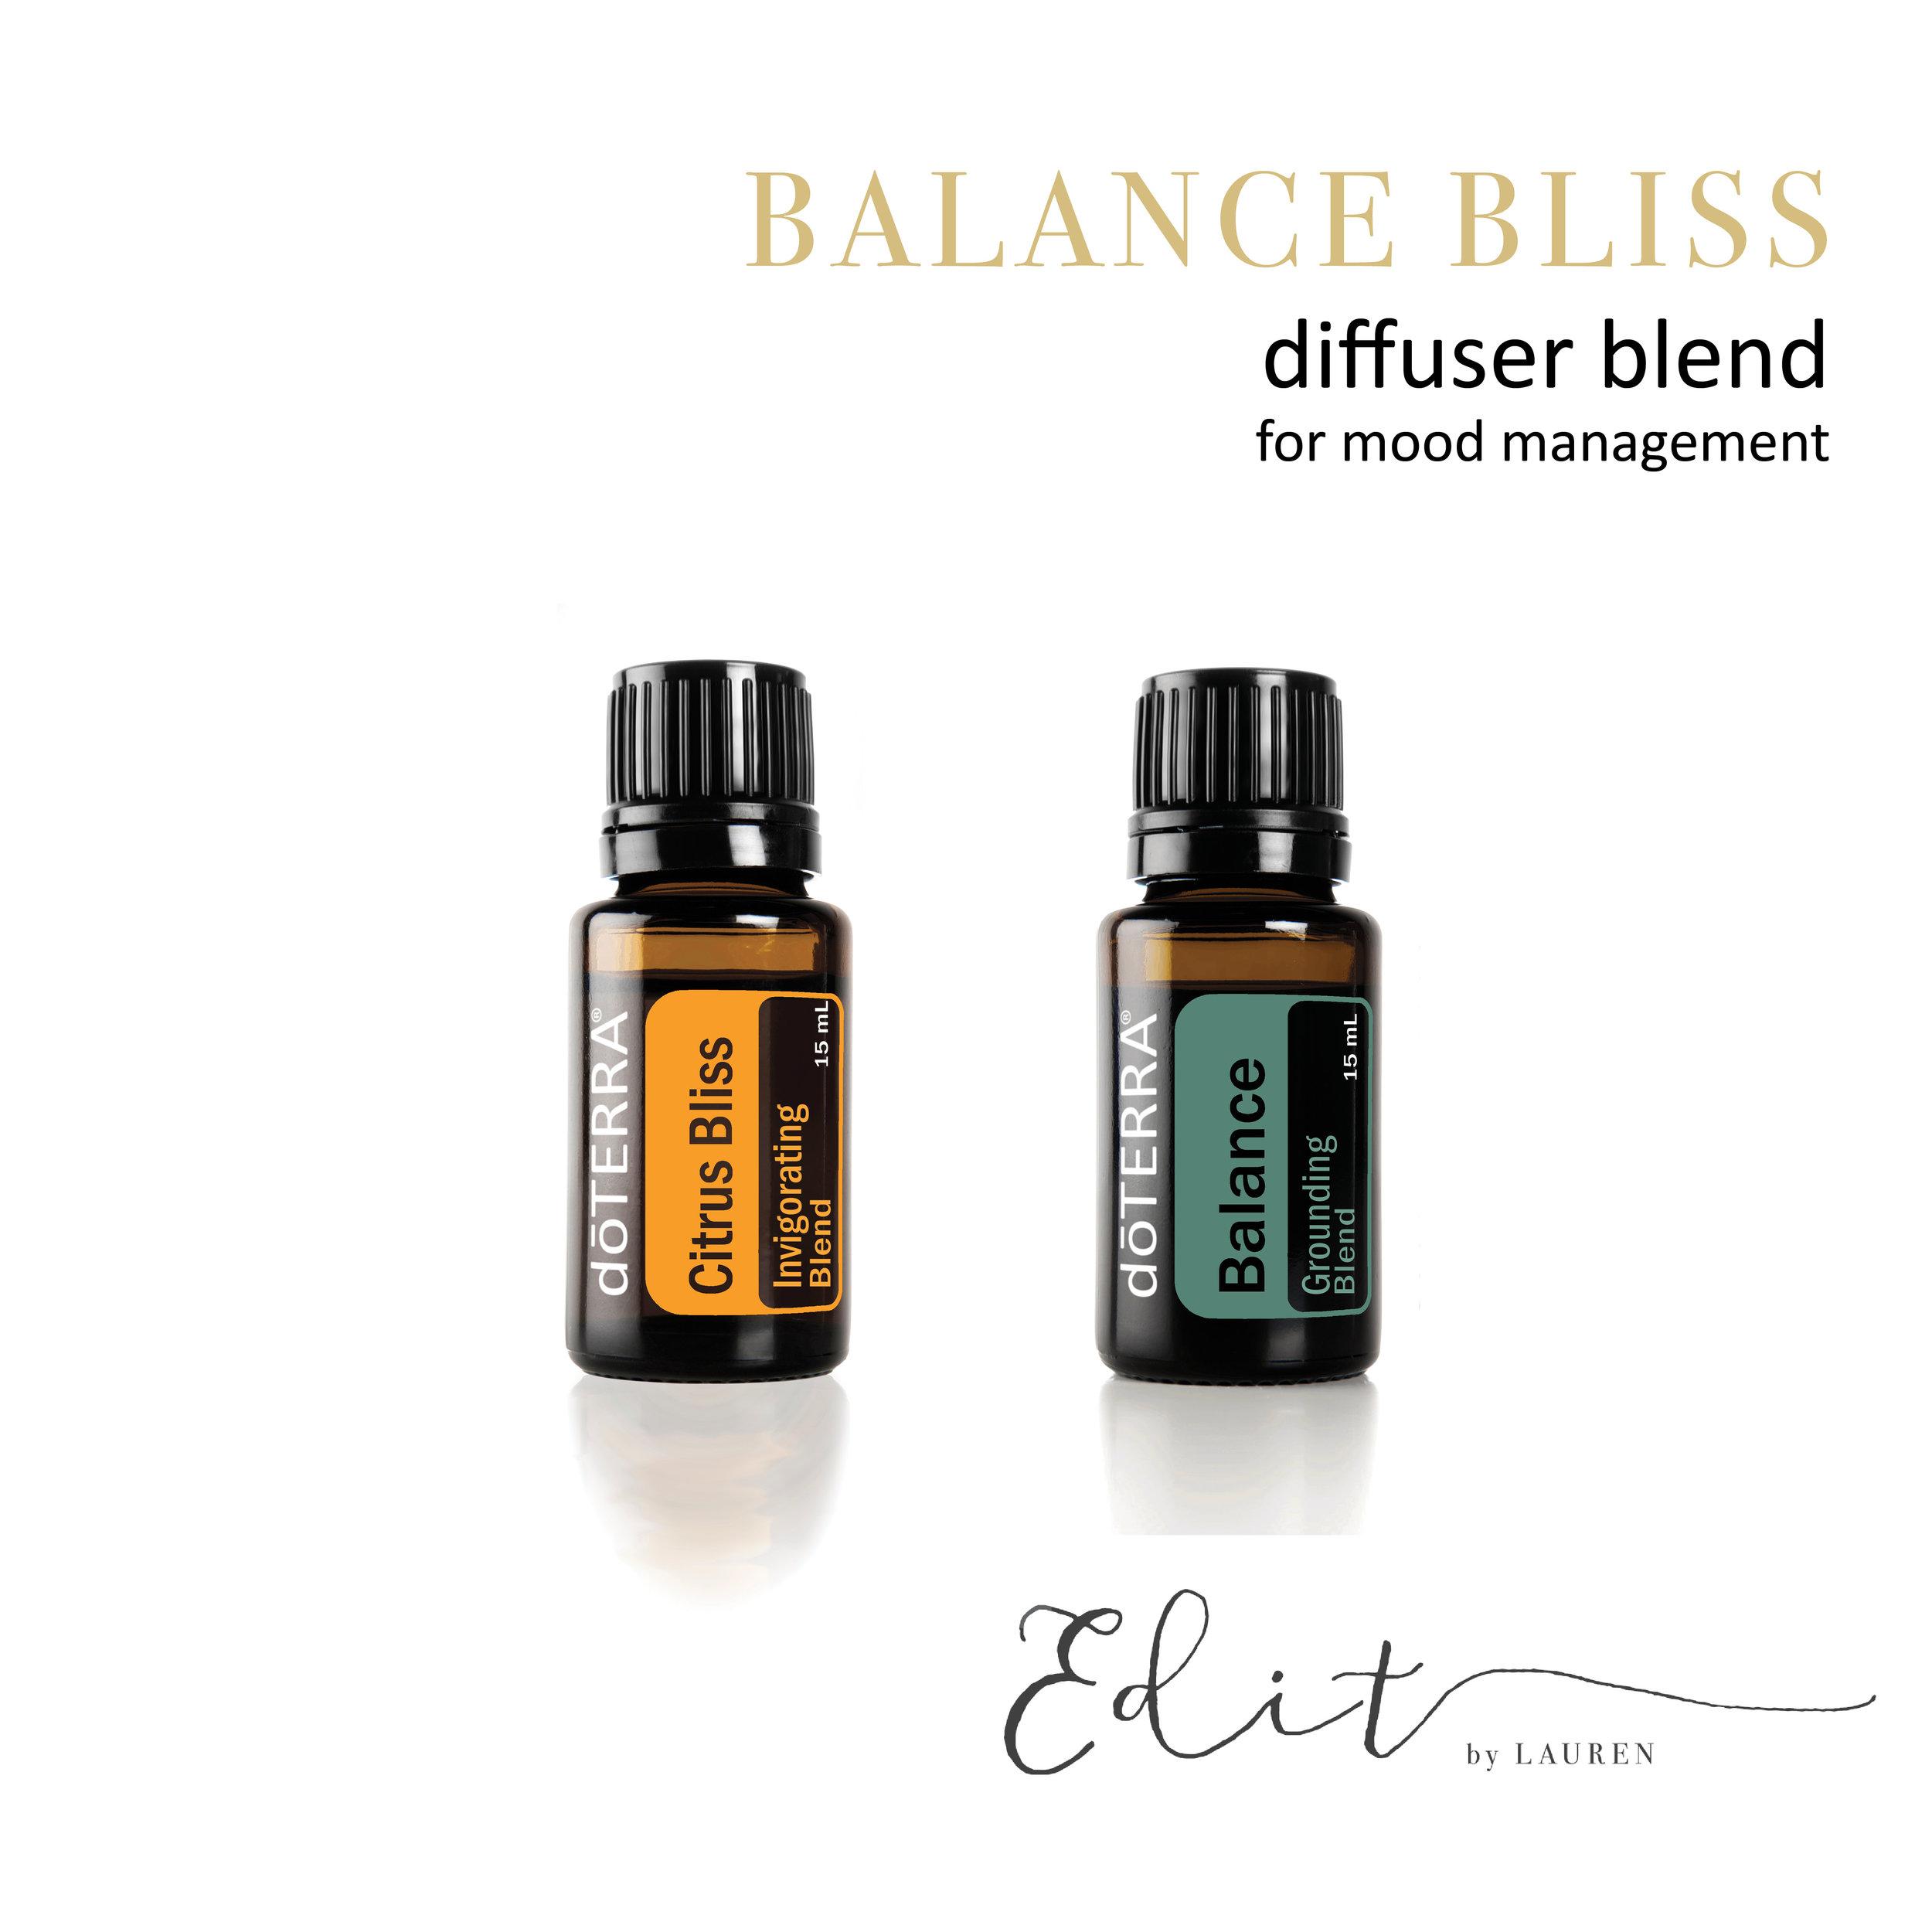 BalanceBlissDiffuser.jpg